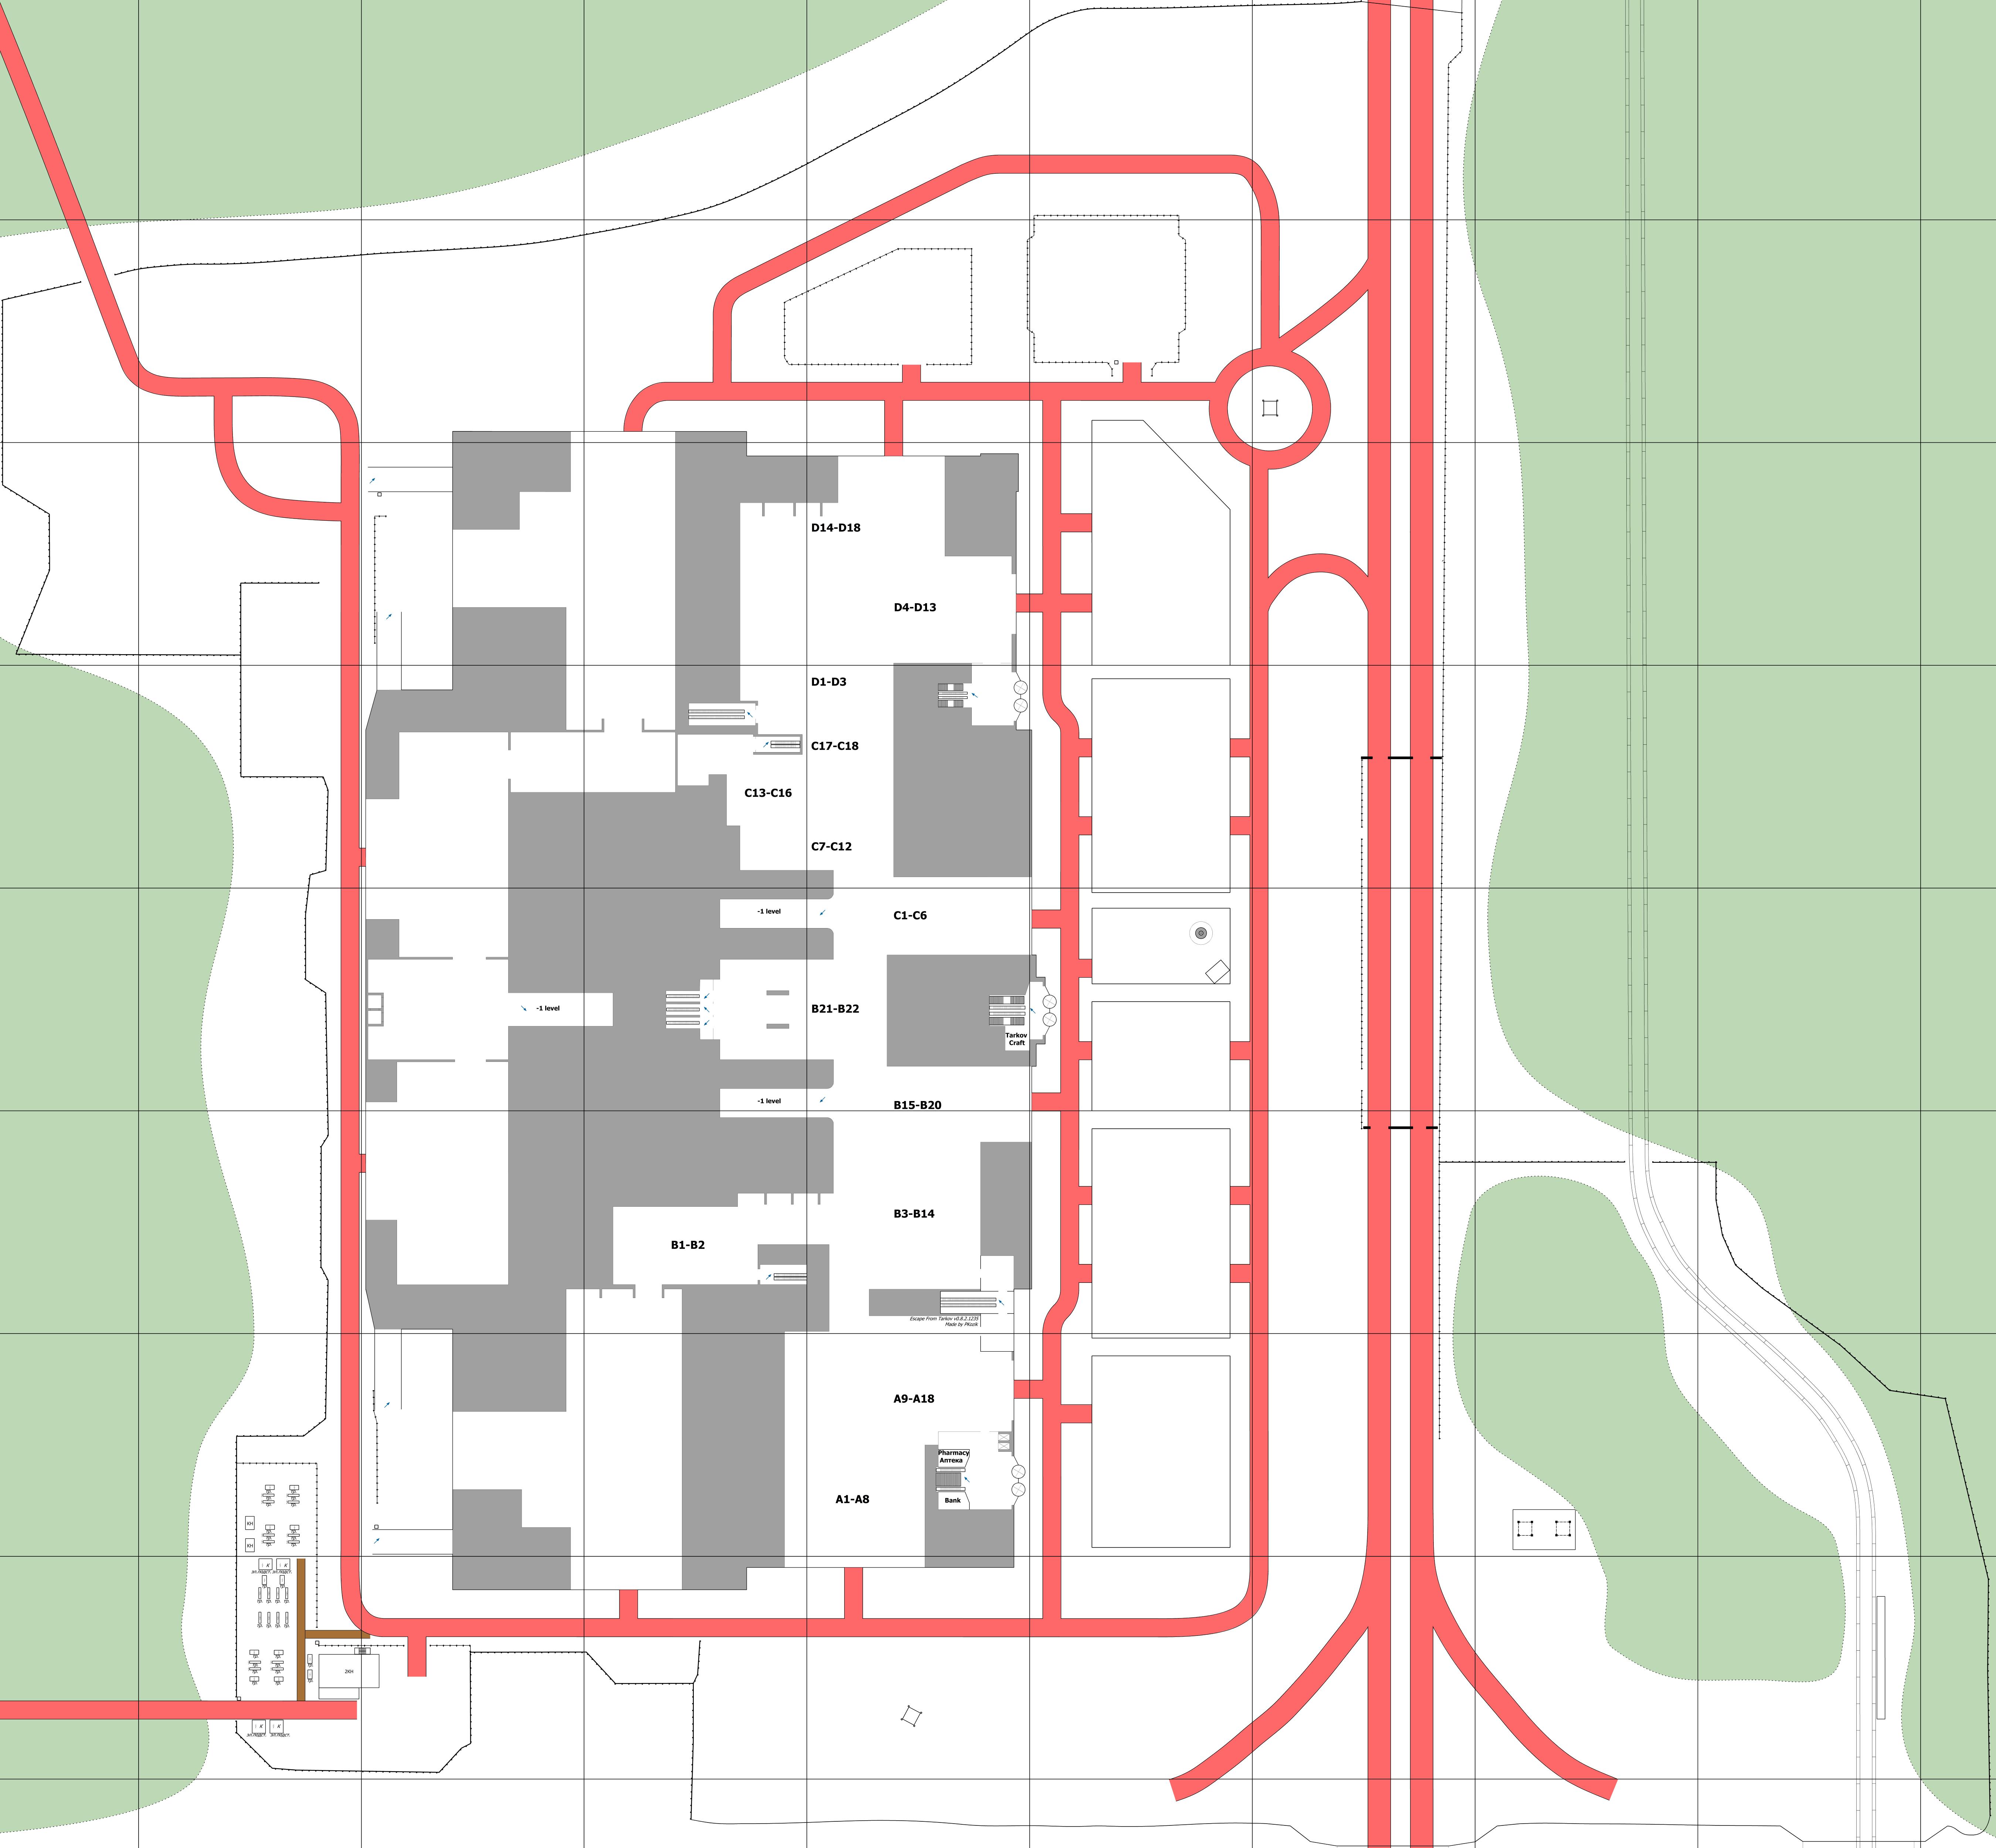 Interchange_ground level_apr2018.png